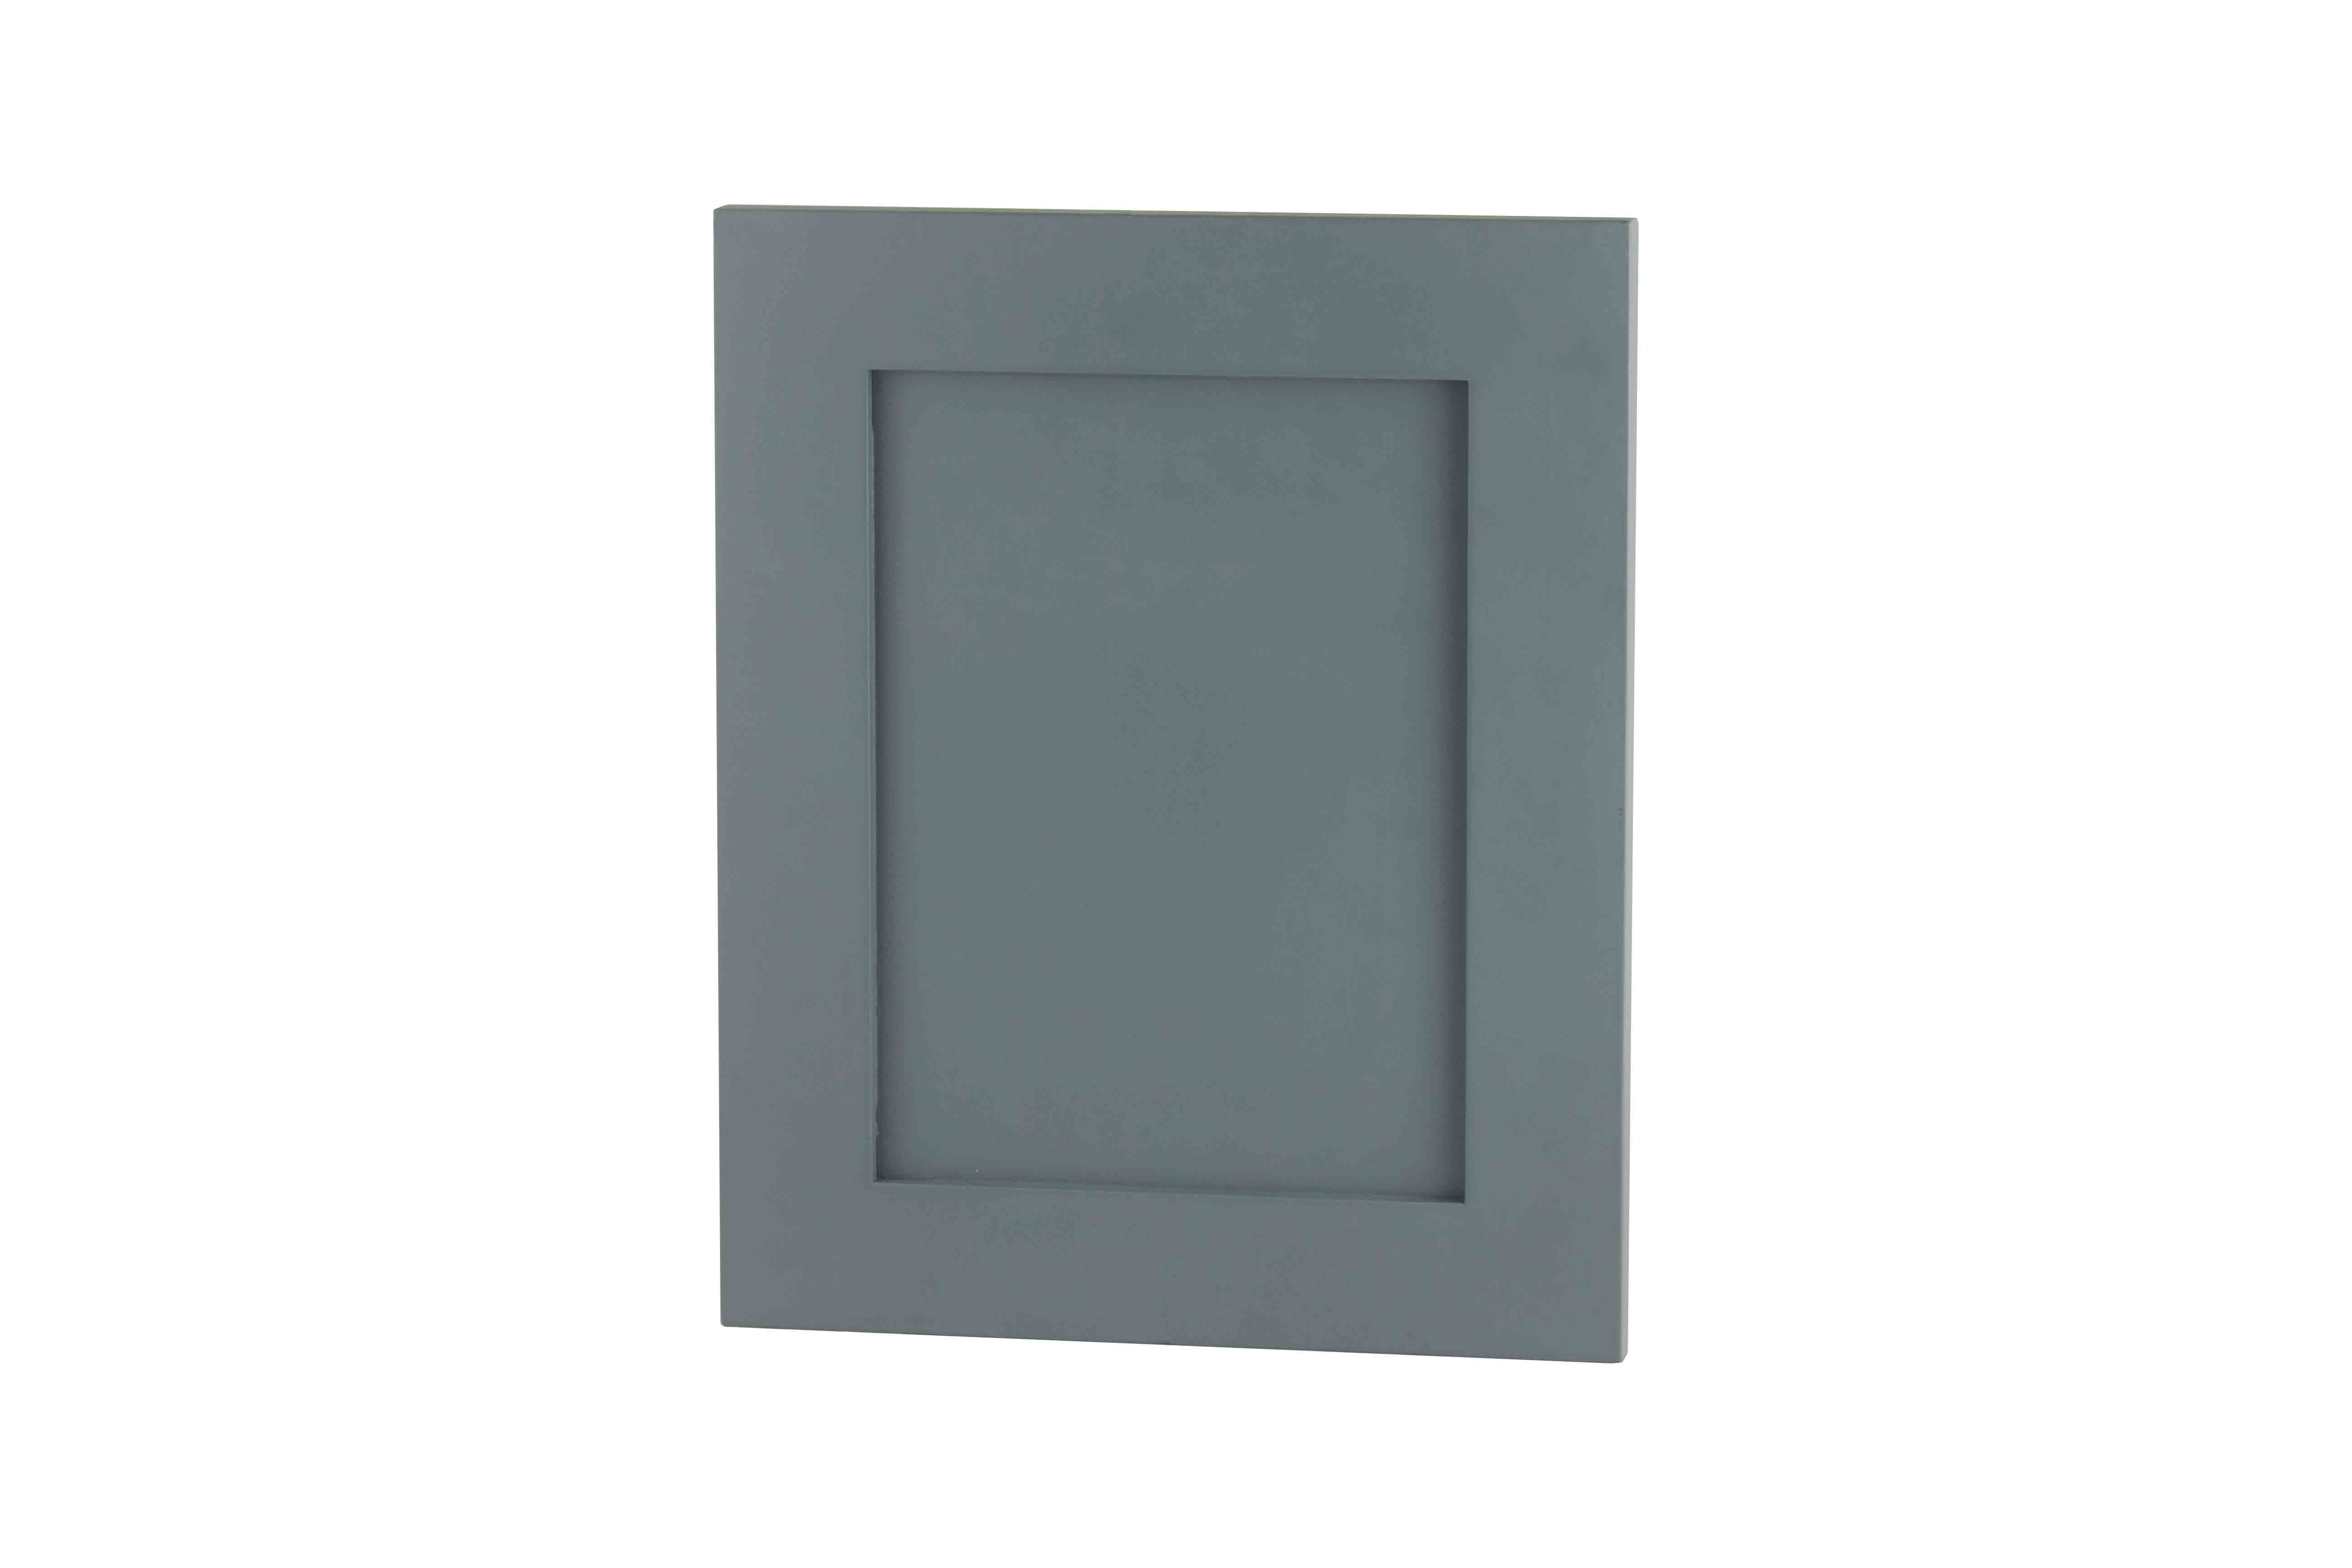 Cabinet Door Style Raised Panel Shaker Recessed